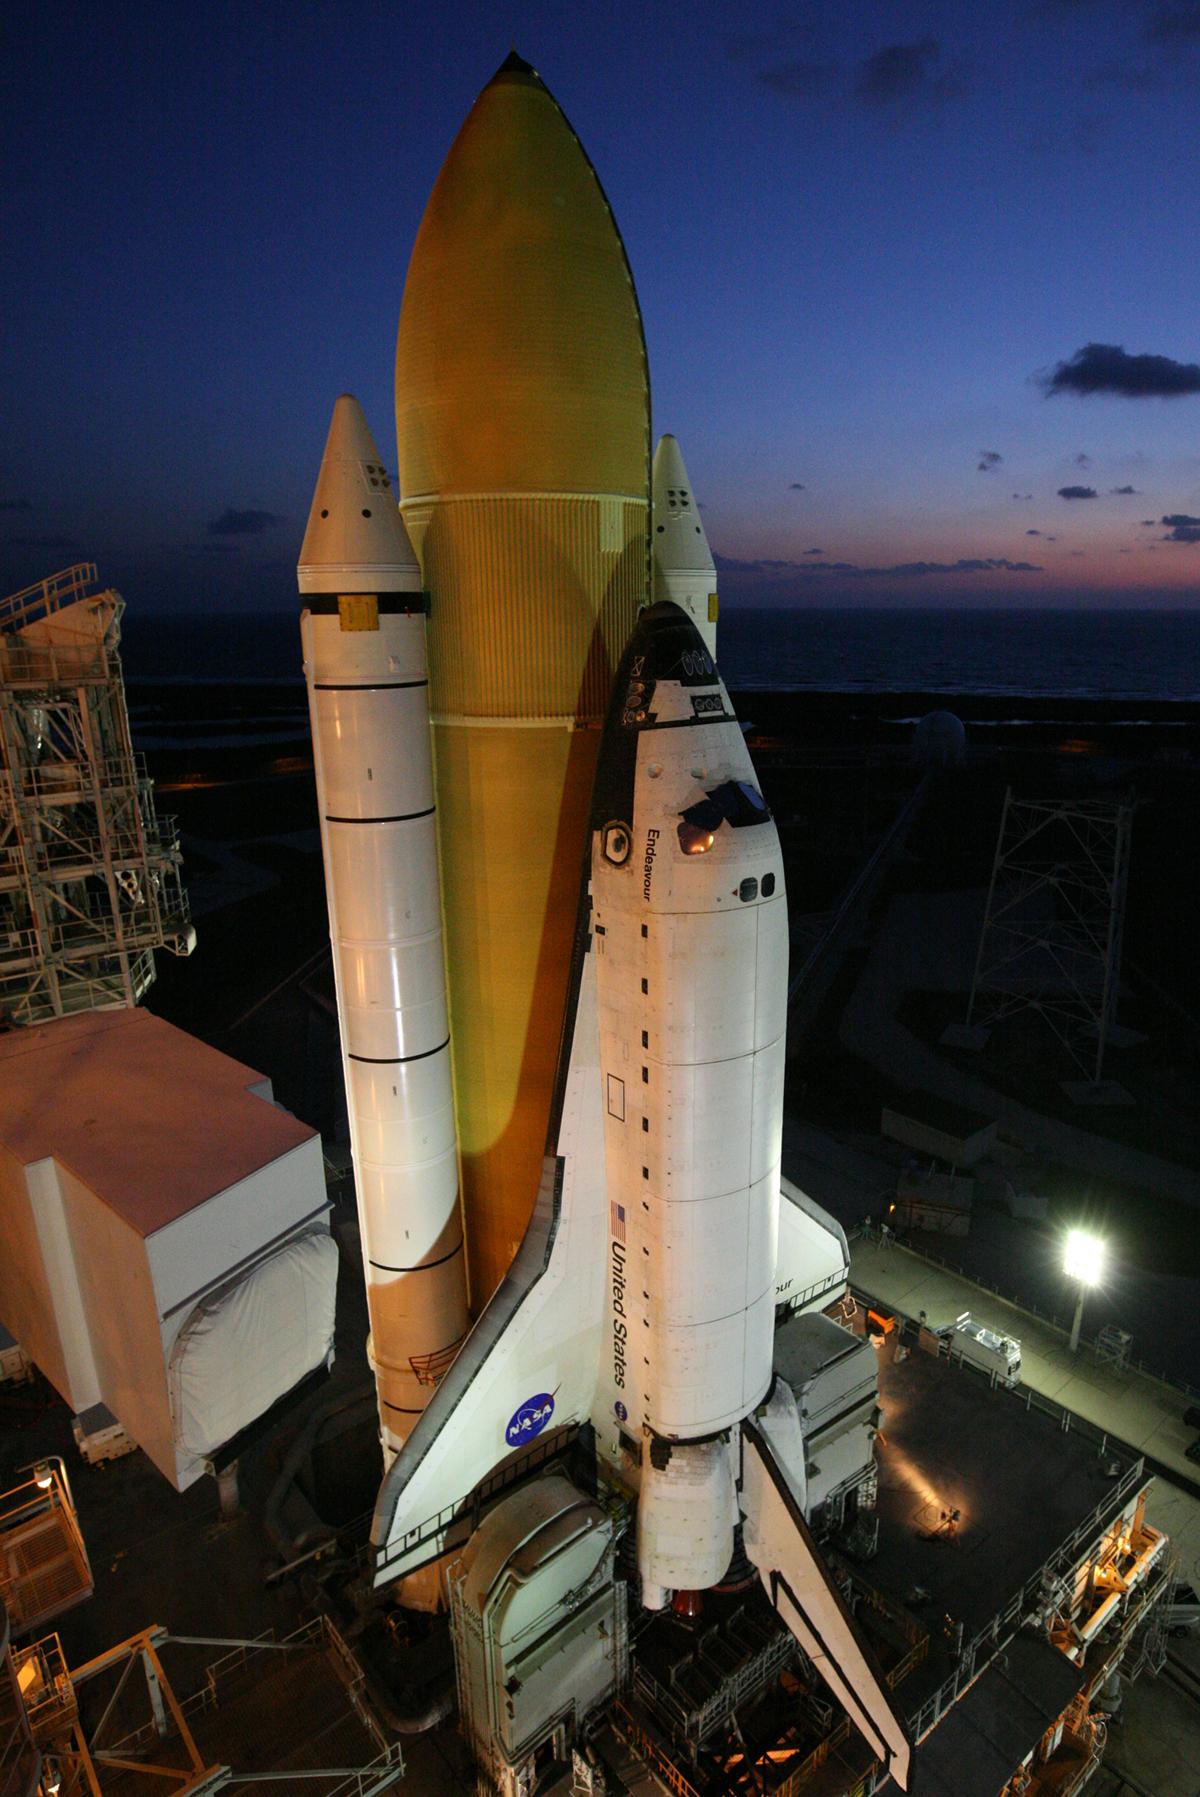 apollo the space shuttle - photo #3